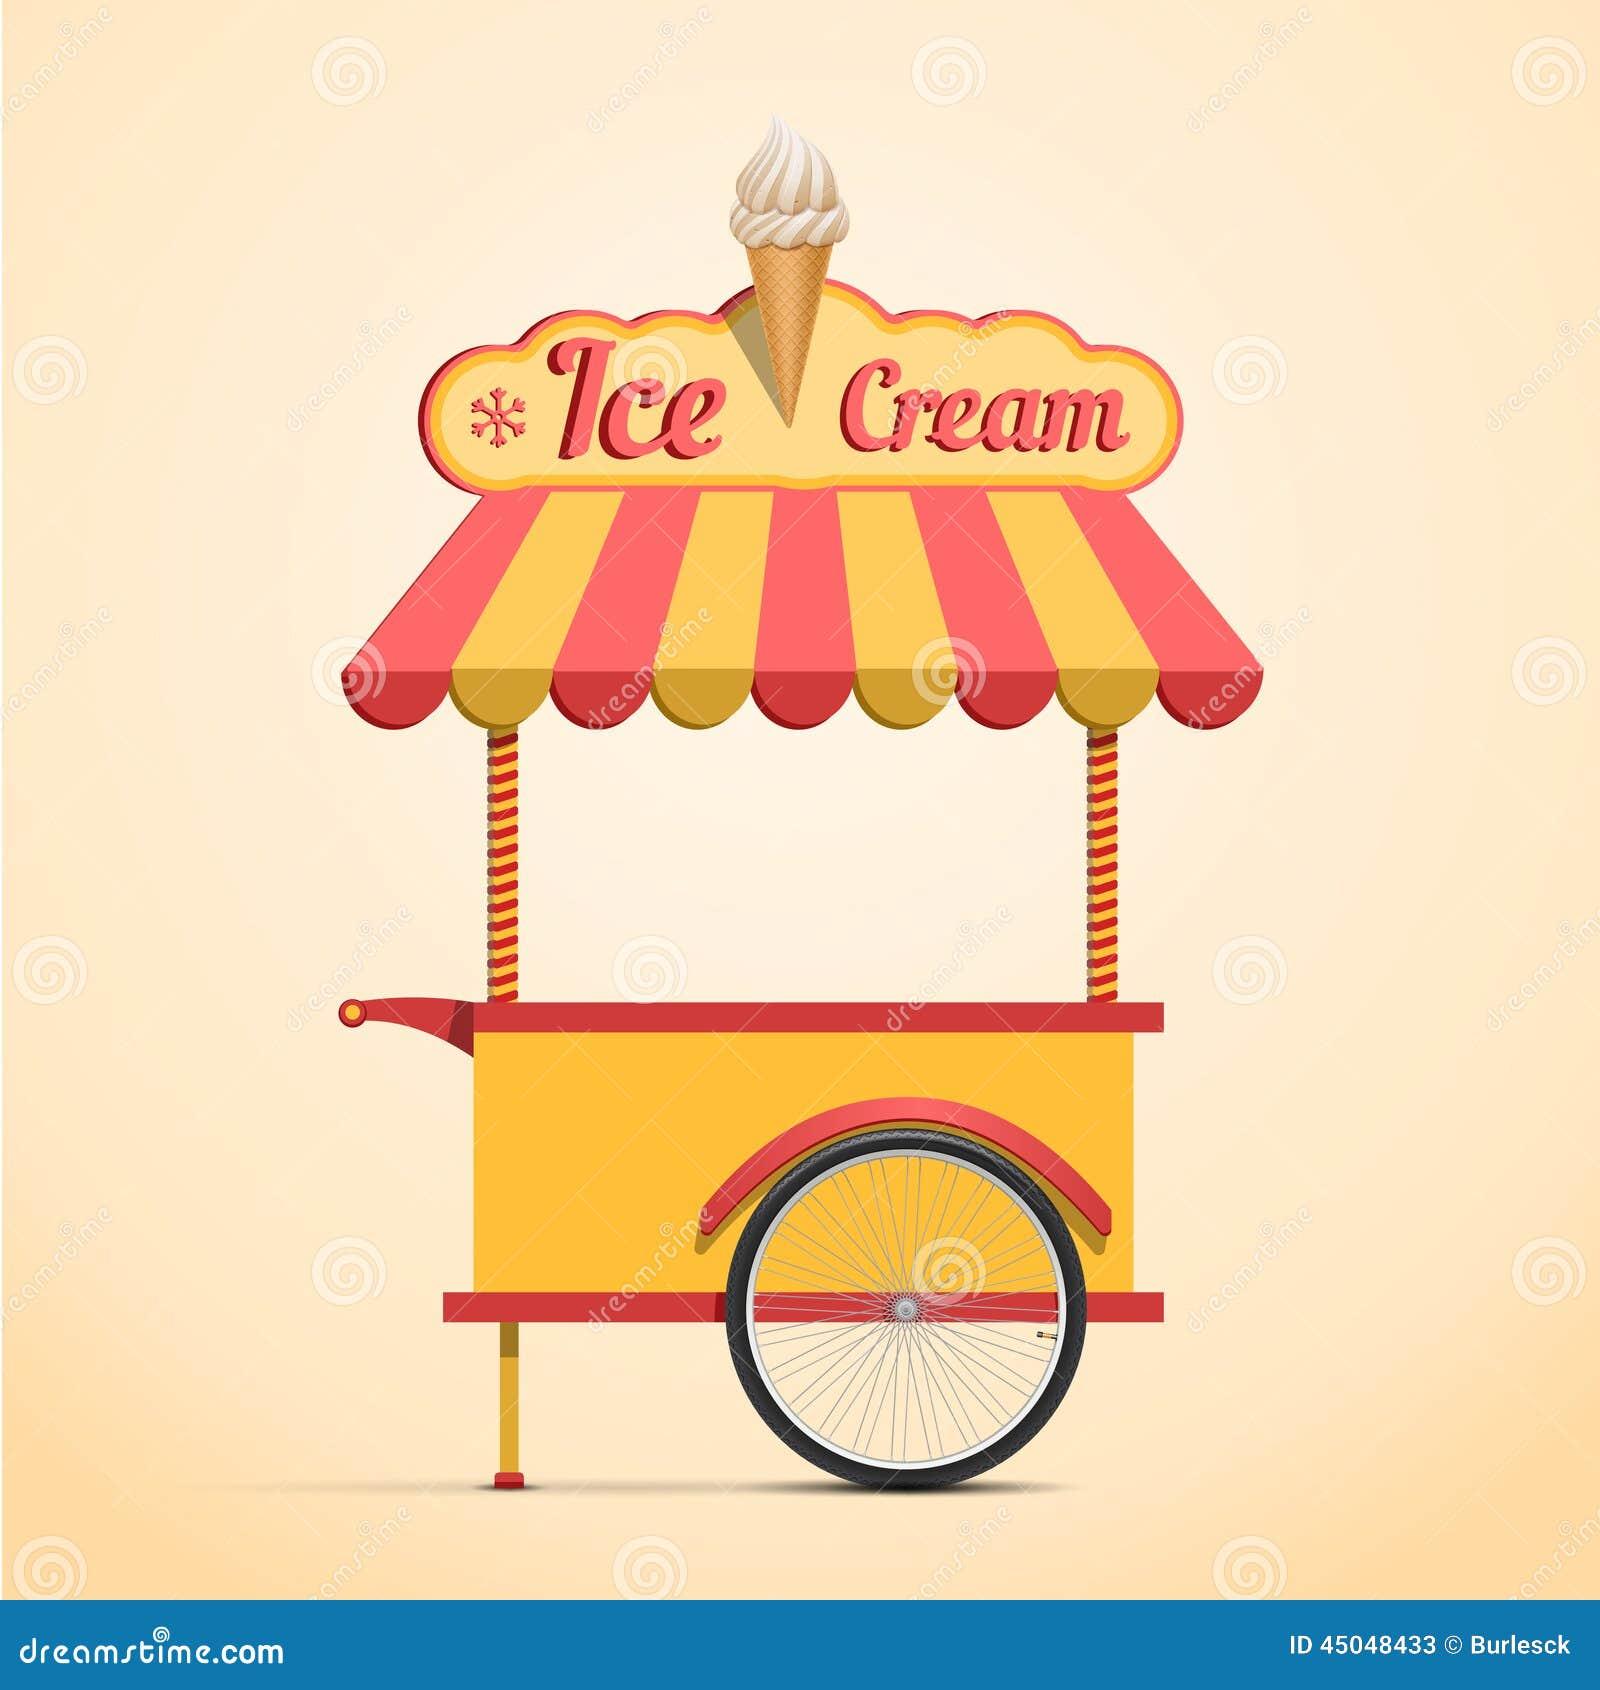 150 Cute Creative Ice Cream Shop Names